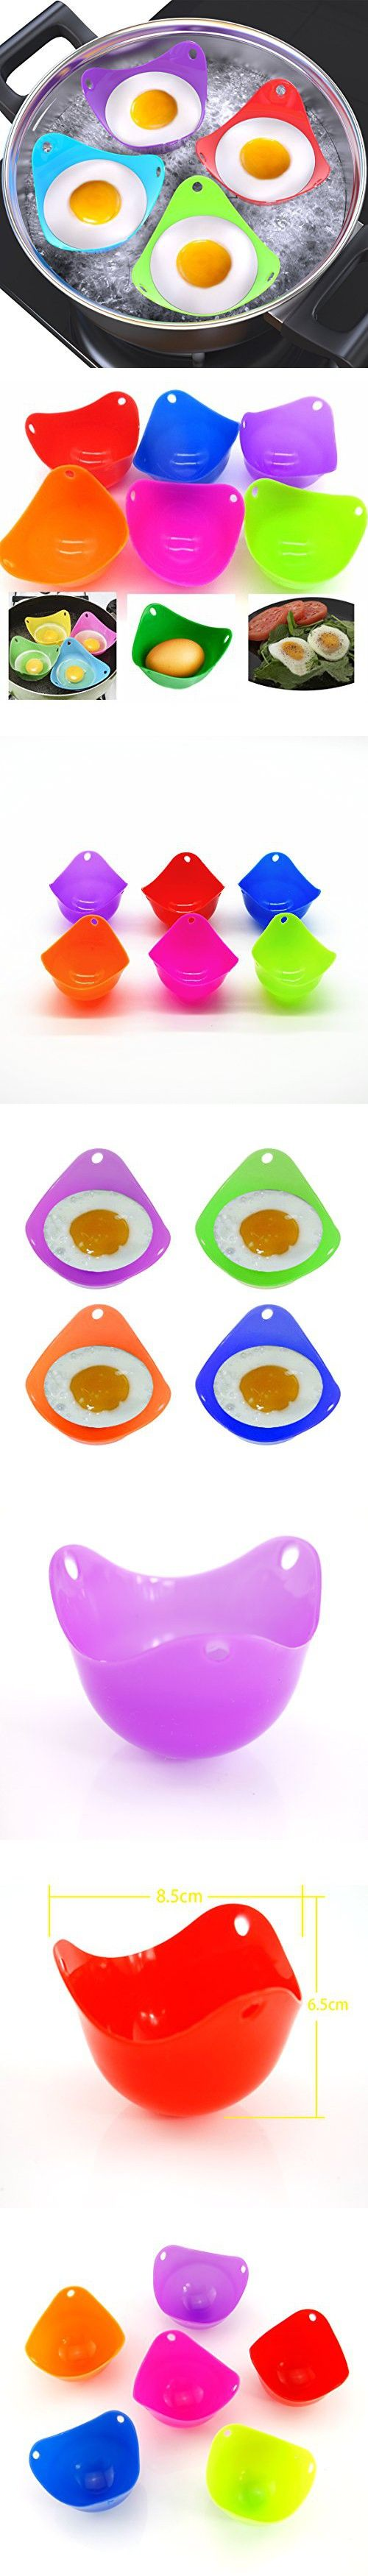 ESport 6 Pieces Silicone Egg Poacher Cups, Unique Colorful Egg Boiler Cookware Poaching Pouches - Replace Your Microwave Egg Poacher